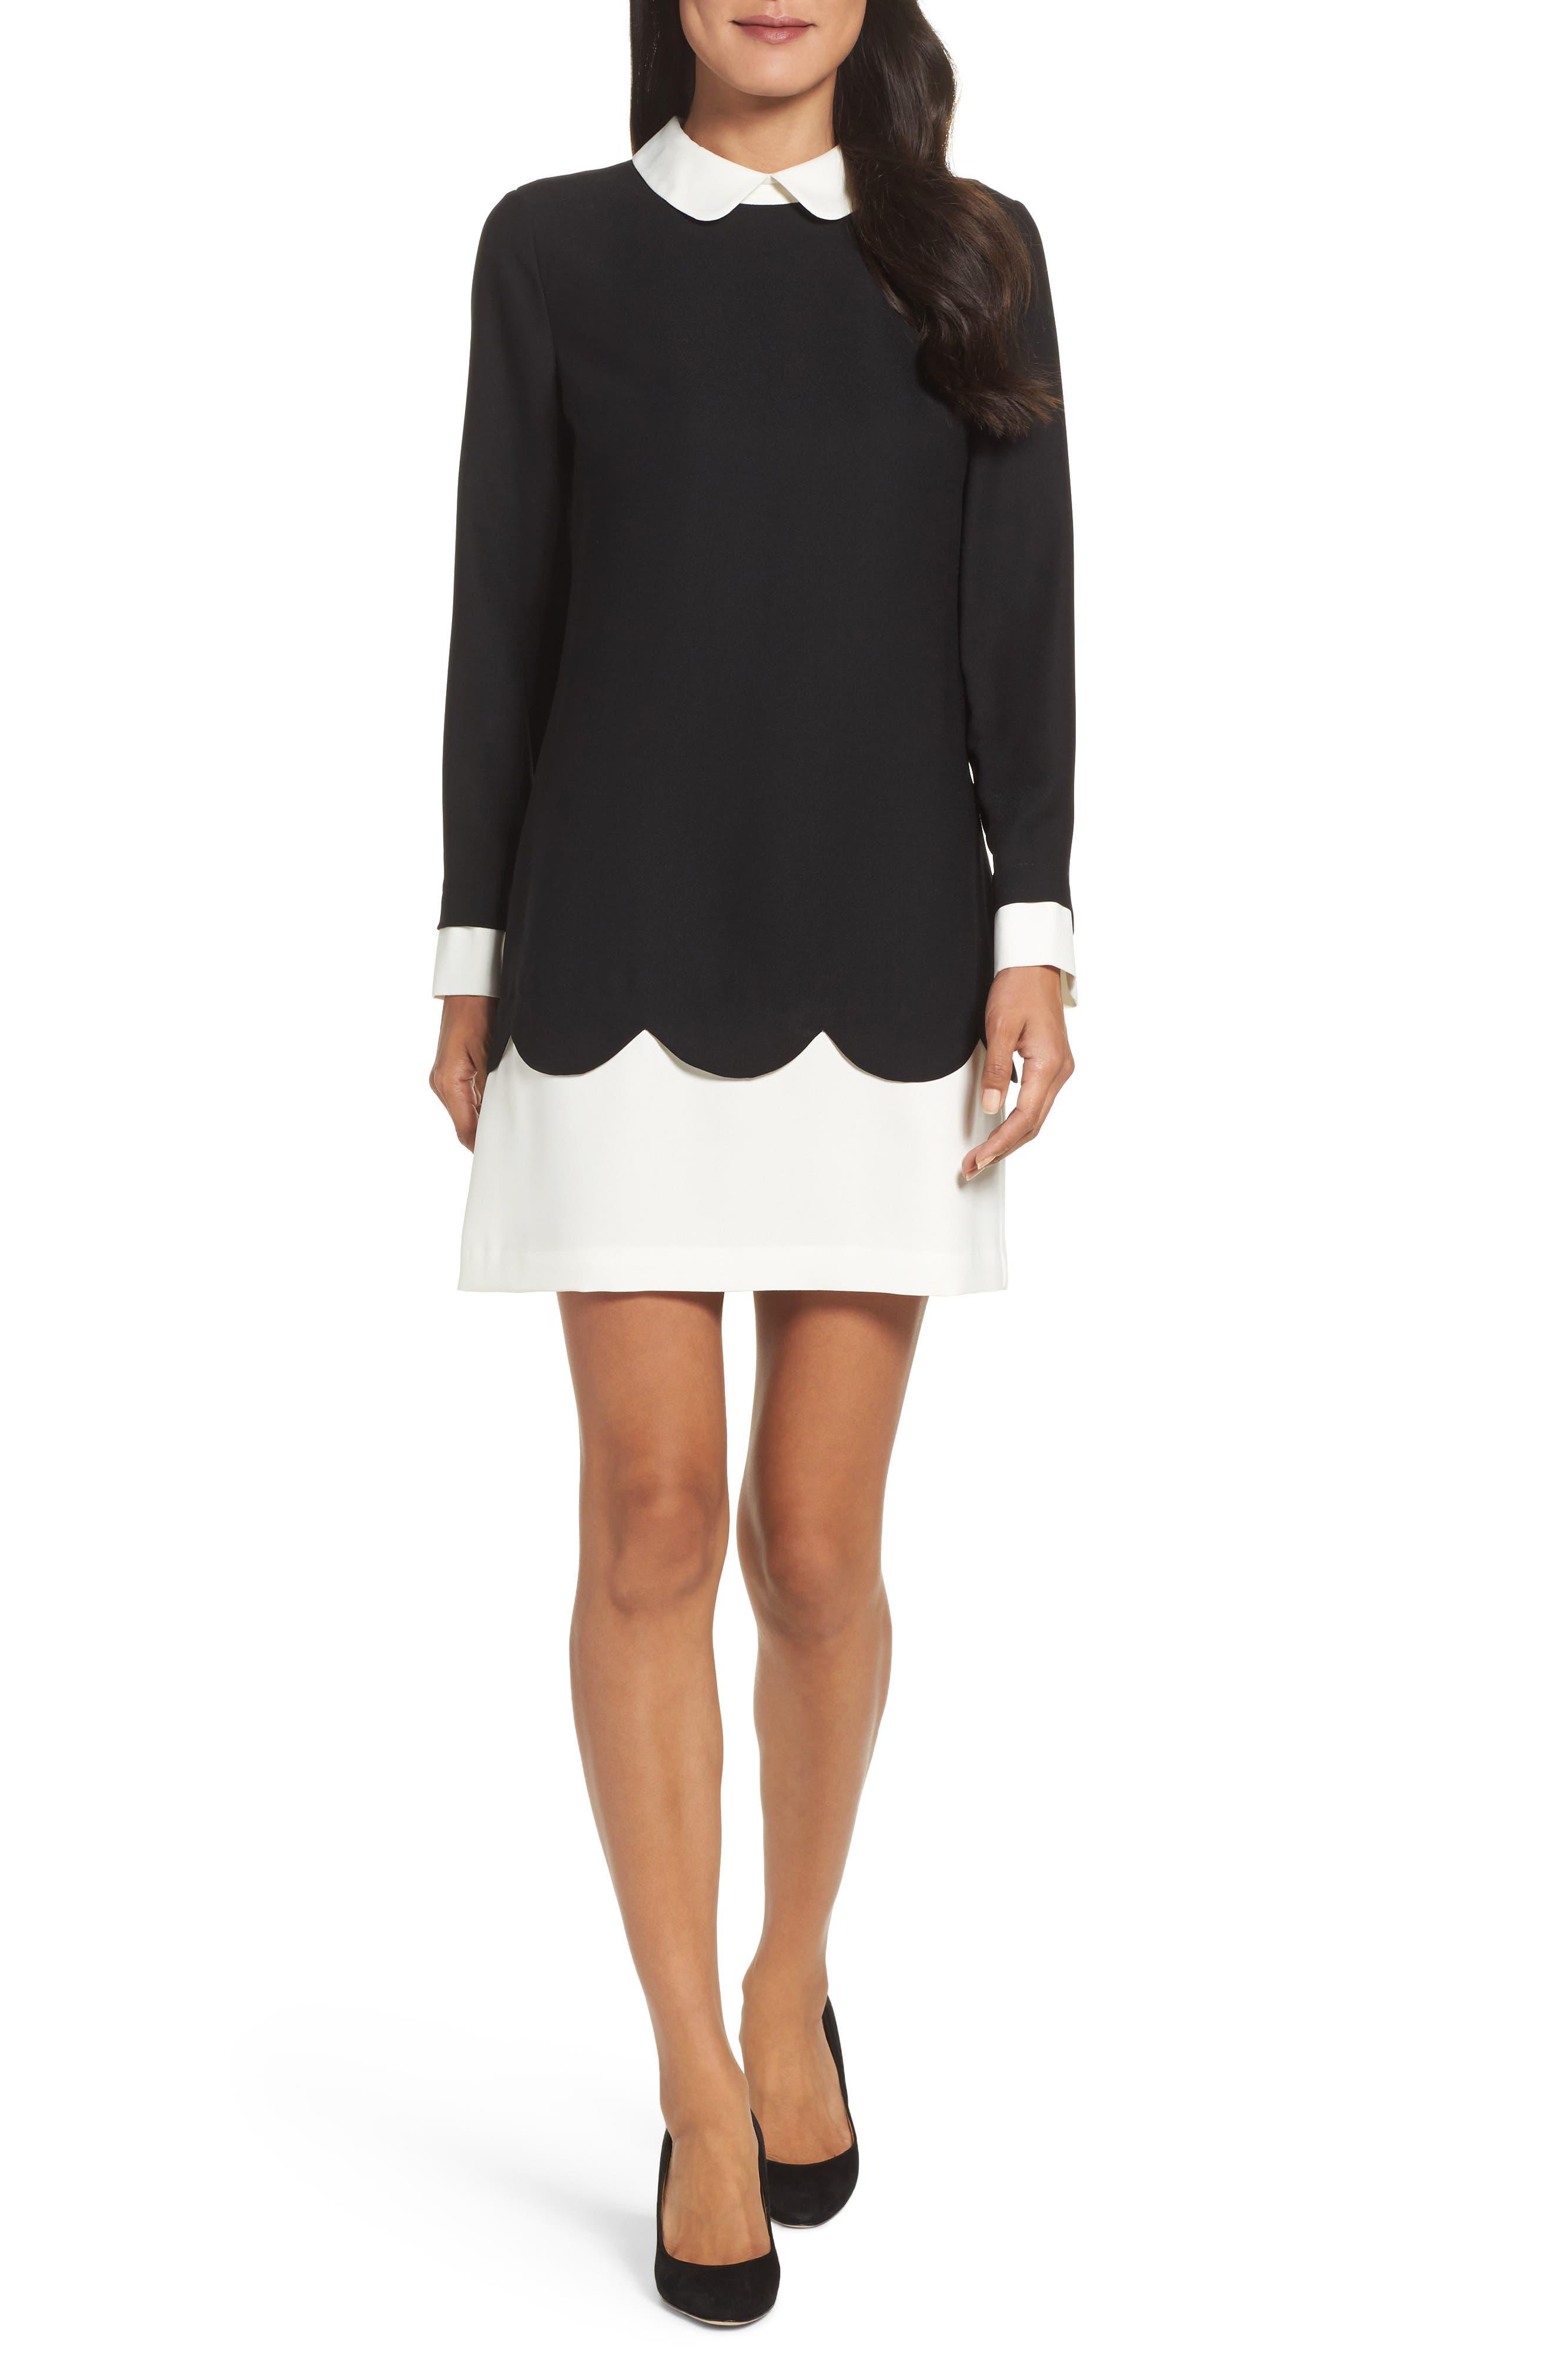 Alternate Image 1 Selected - Cece Jada Scallop Shirtdress (Regular & Petite)